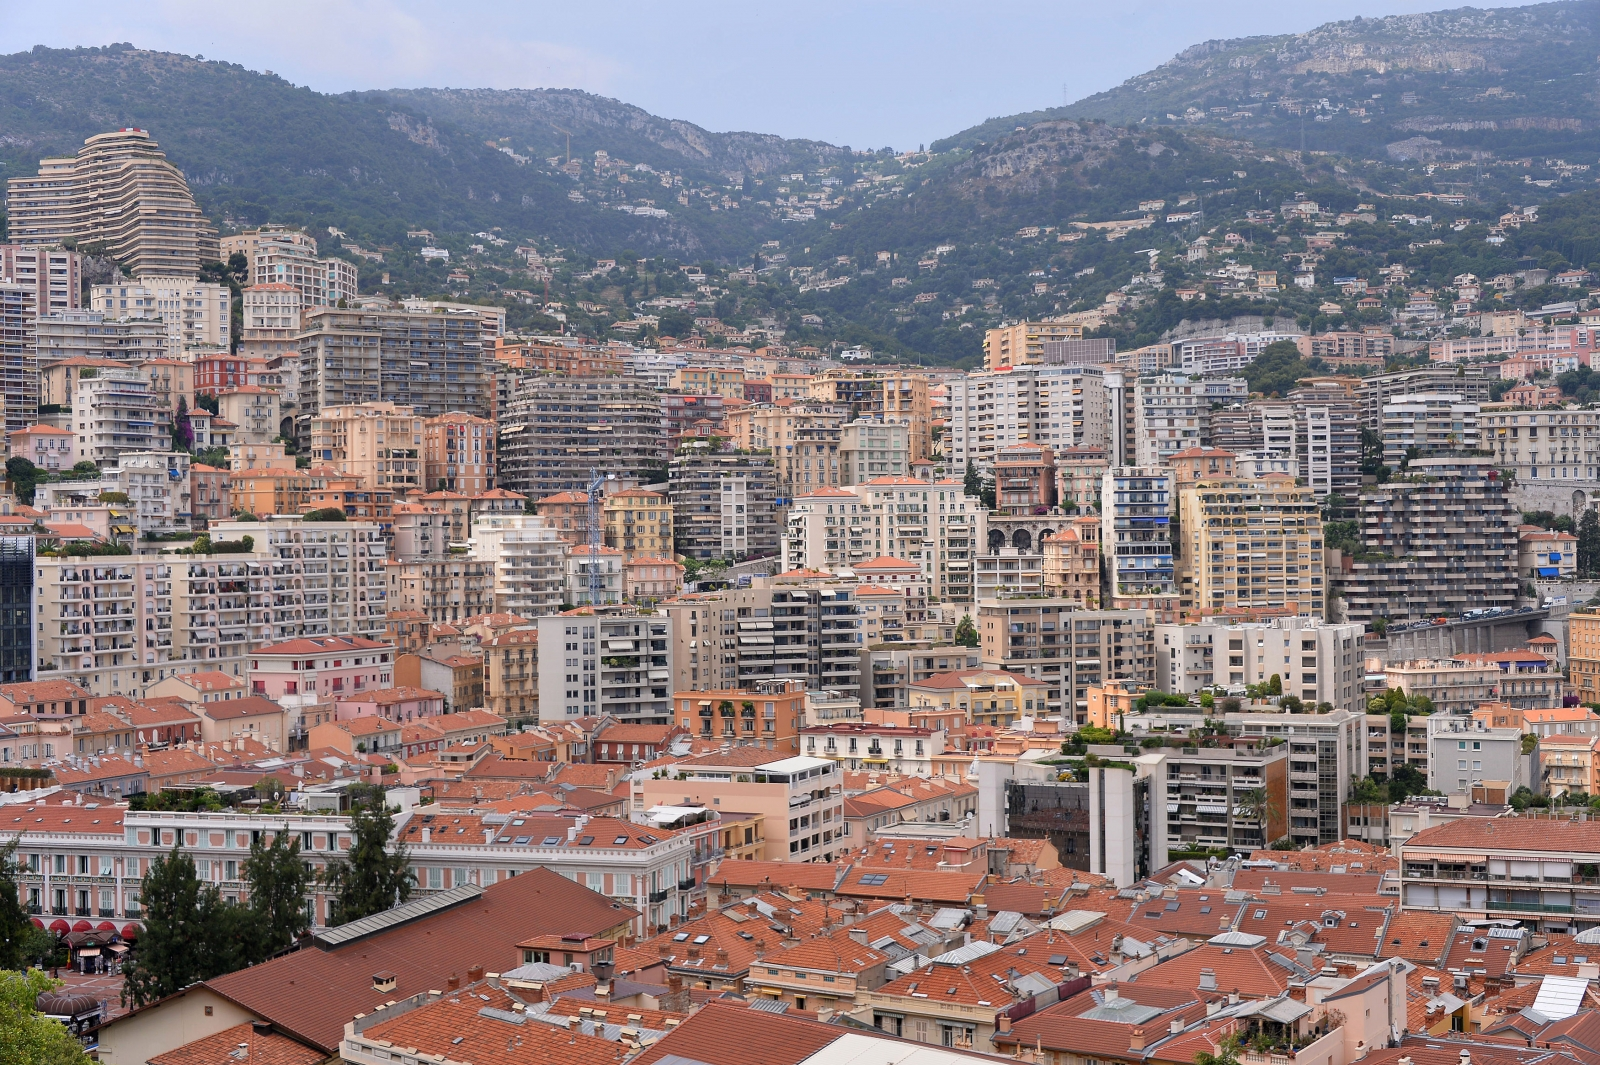 Buildings in Monaco